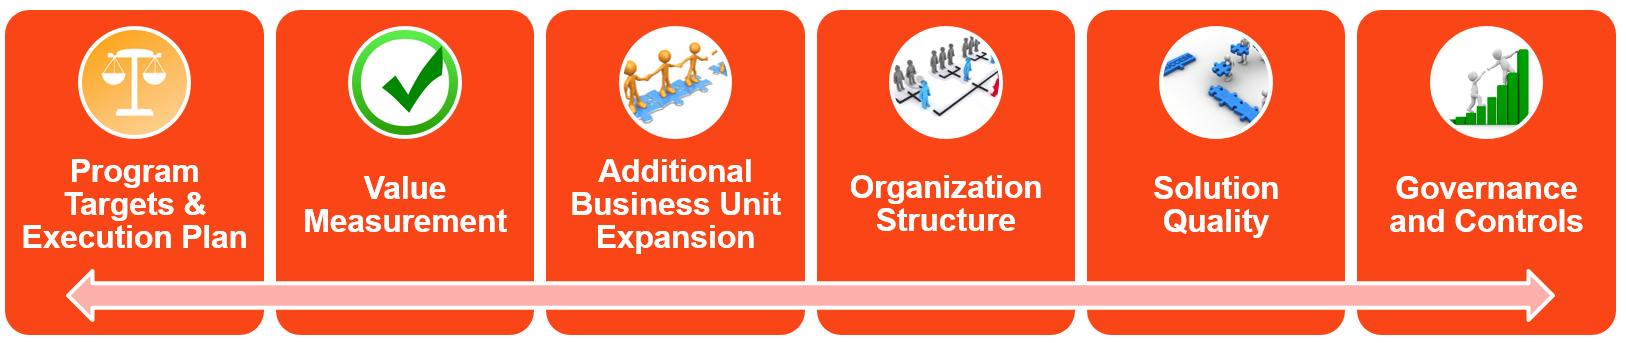 automation-operating-model-program-elements-uipath